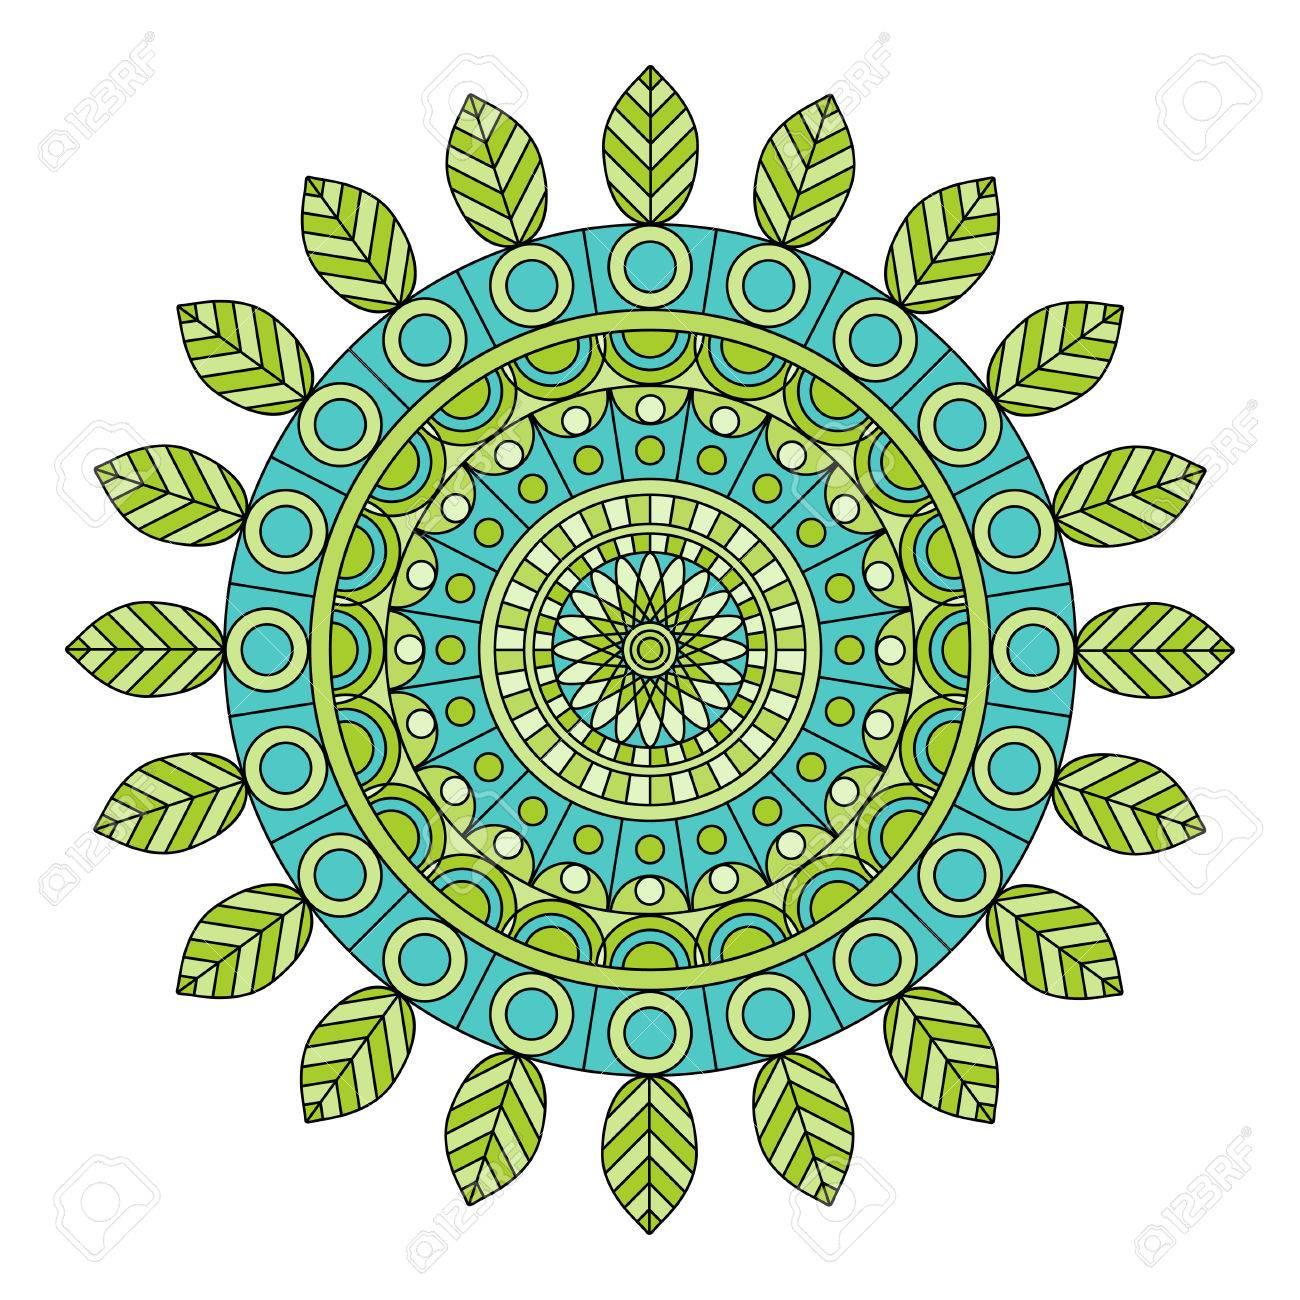 Color Floral Mandala Vector Illustration Royalty Free Cliparts